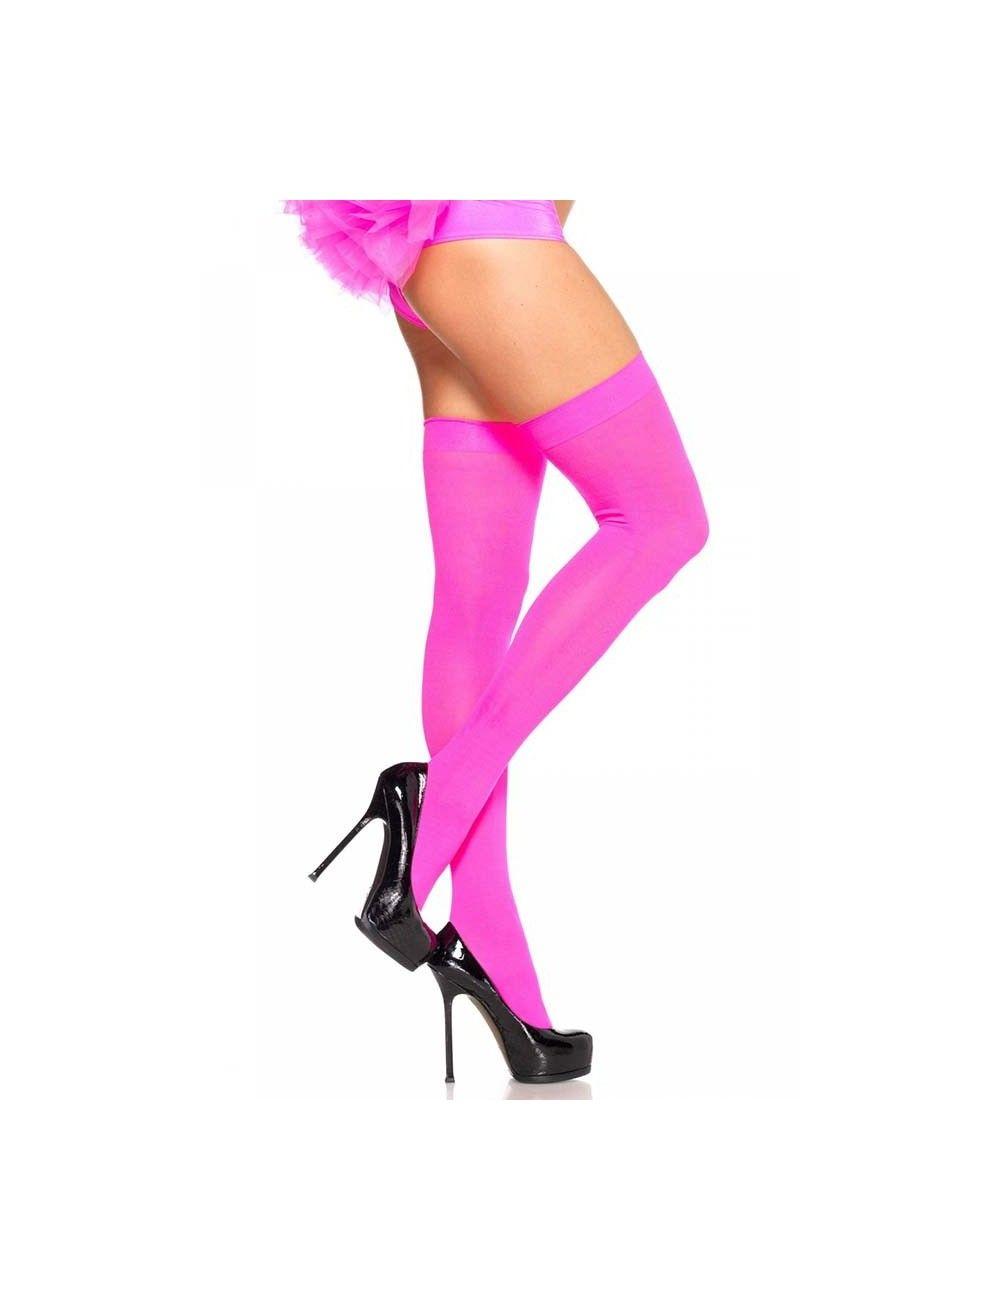 Bas opaques néon rose en nylon Leg Avenue